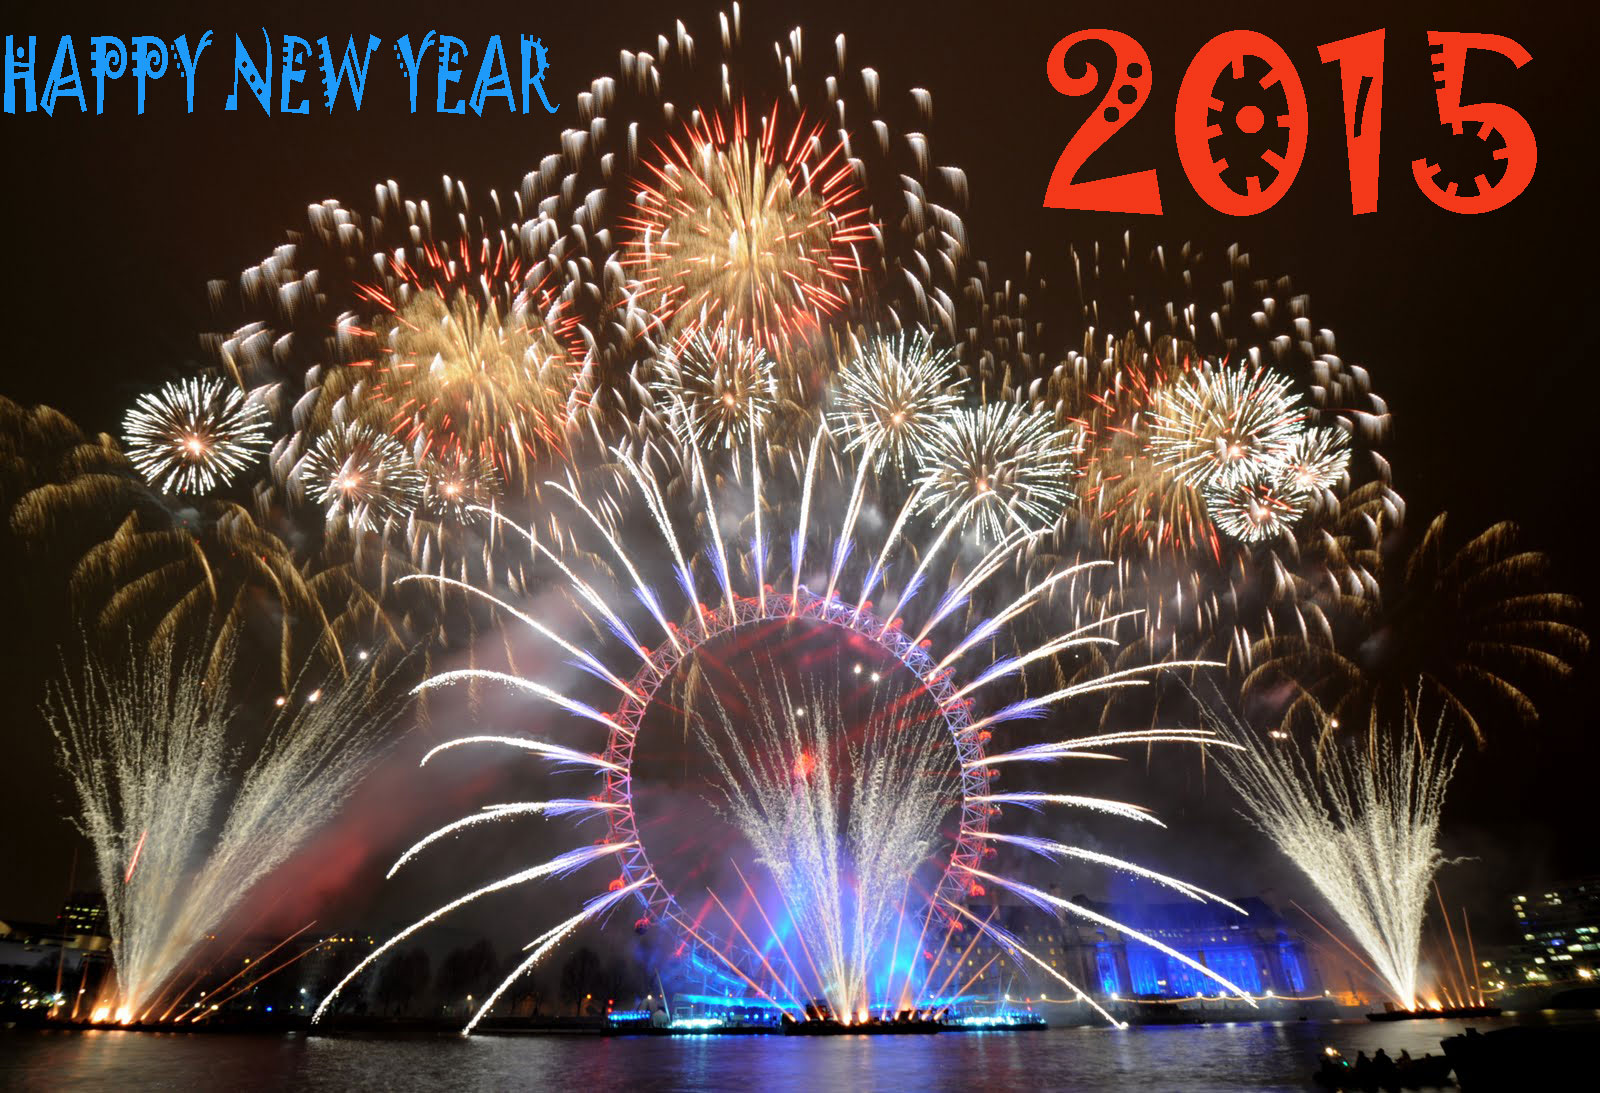 Animated New Year Wallpaper 2015 Vinnyoleo Vegetalinfo